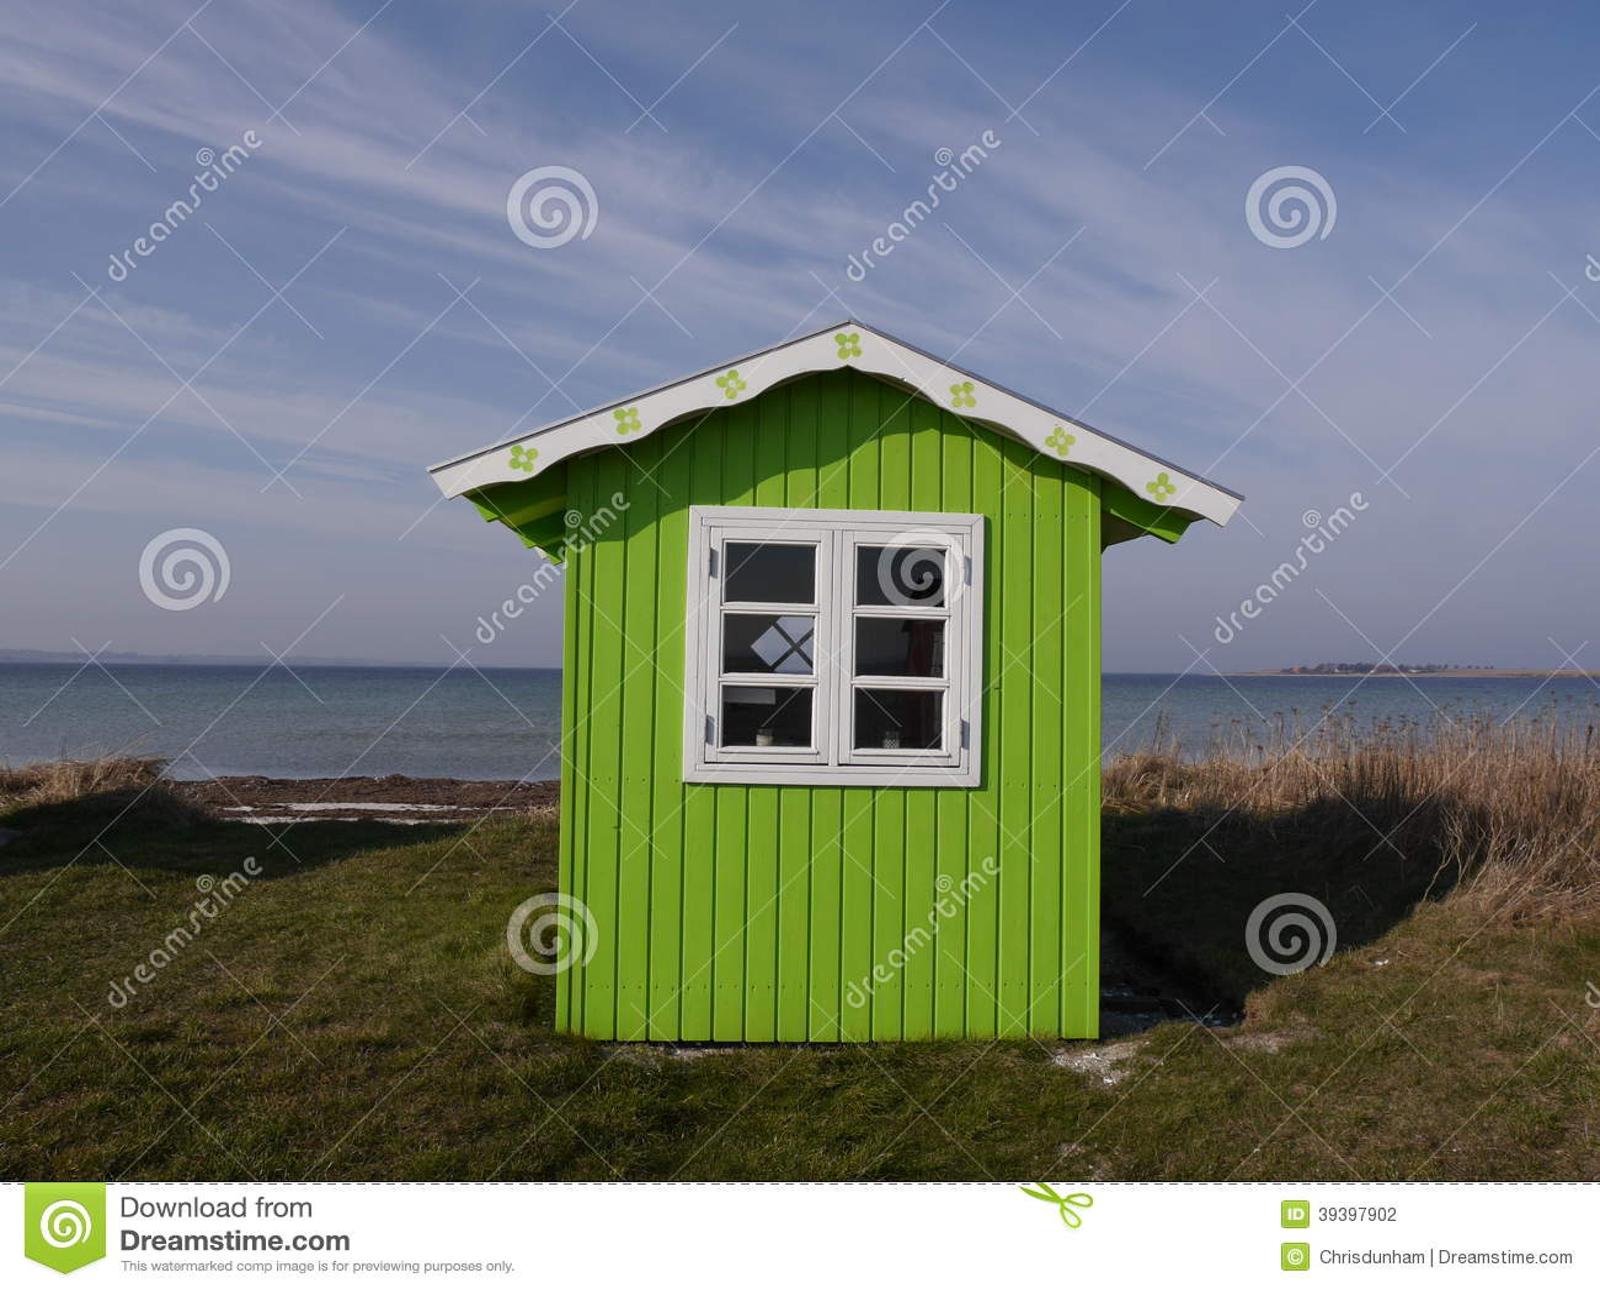 Bright Green Beach Hut On Danish Island Of Aeroe With Background Of ...